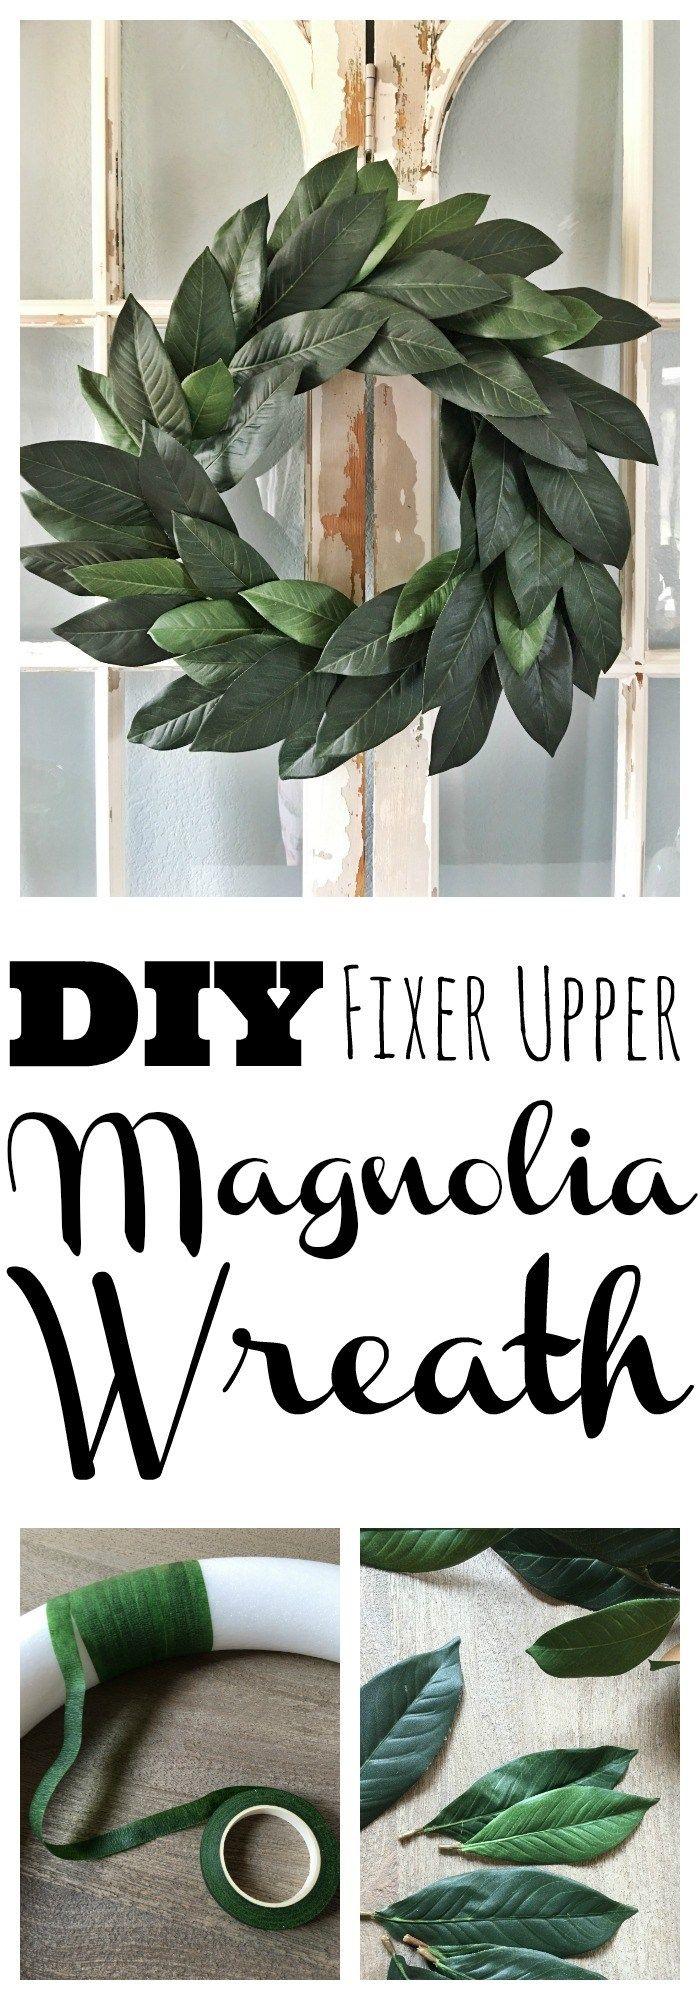 25 best ideas about magnolia home decor on pinterest magnolia homes magnolia homes waco and. Black Bedroom Furniture Sets. Home Design Ideas